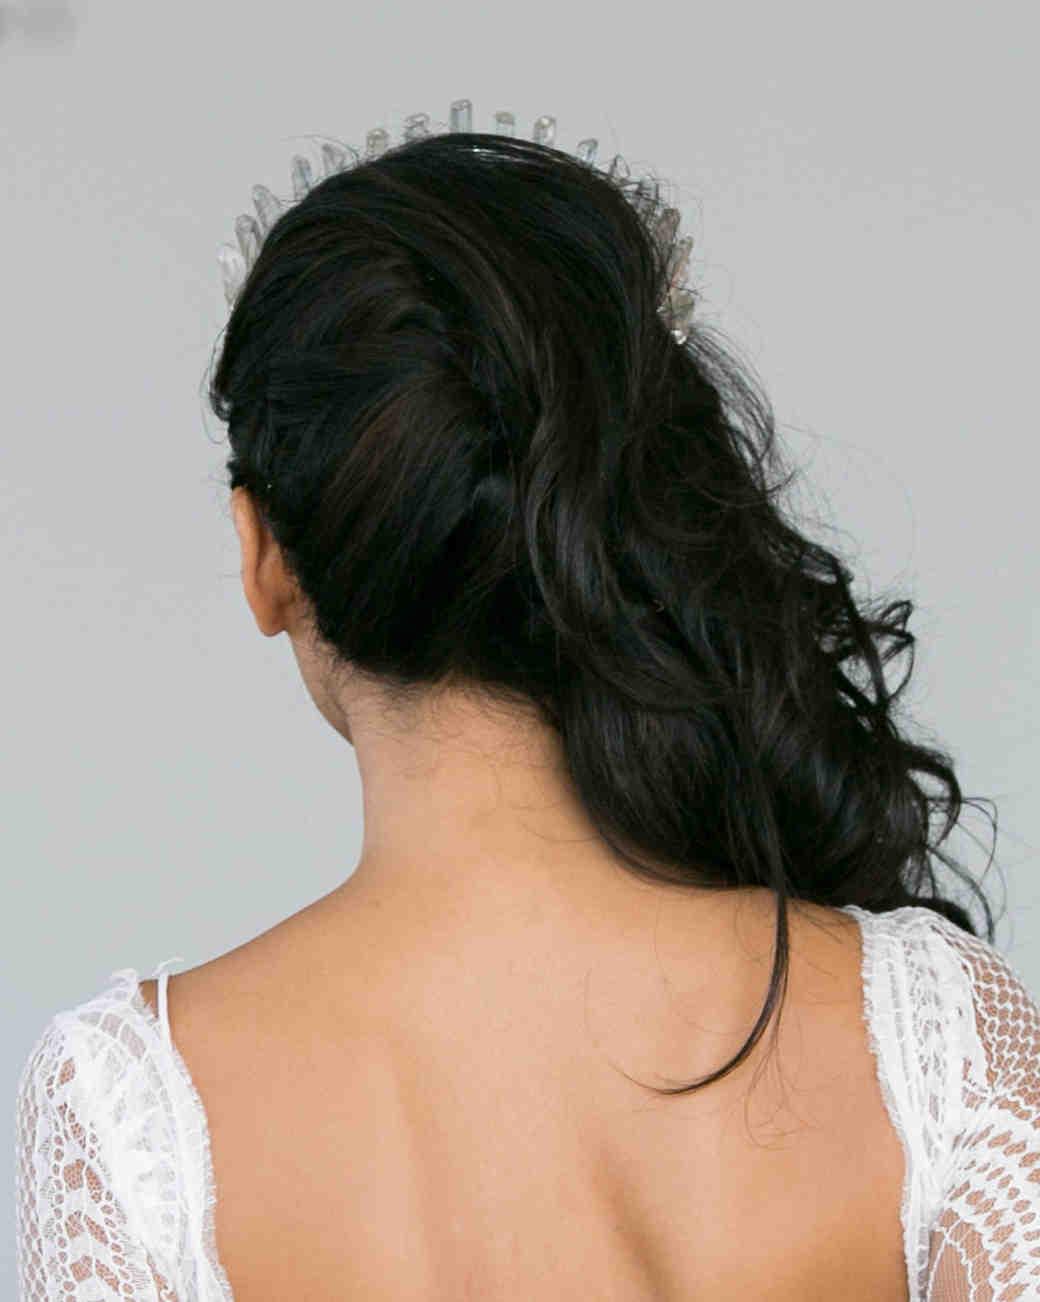 rime-arodaky-fall-2017-wedding-hairstyle-look-1-back-1016